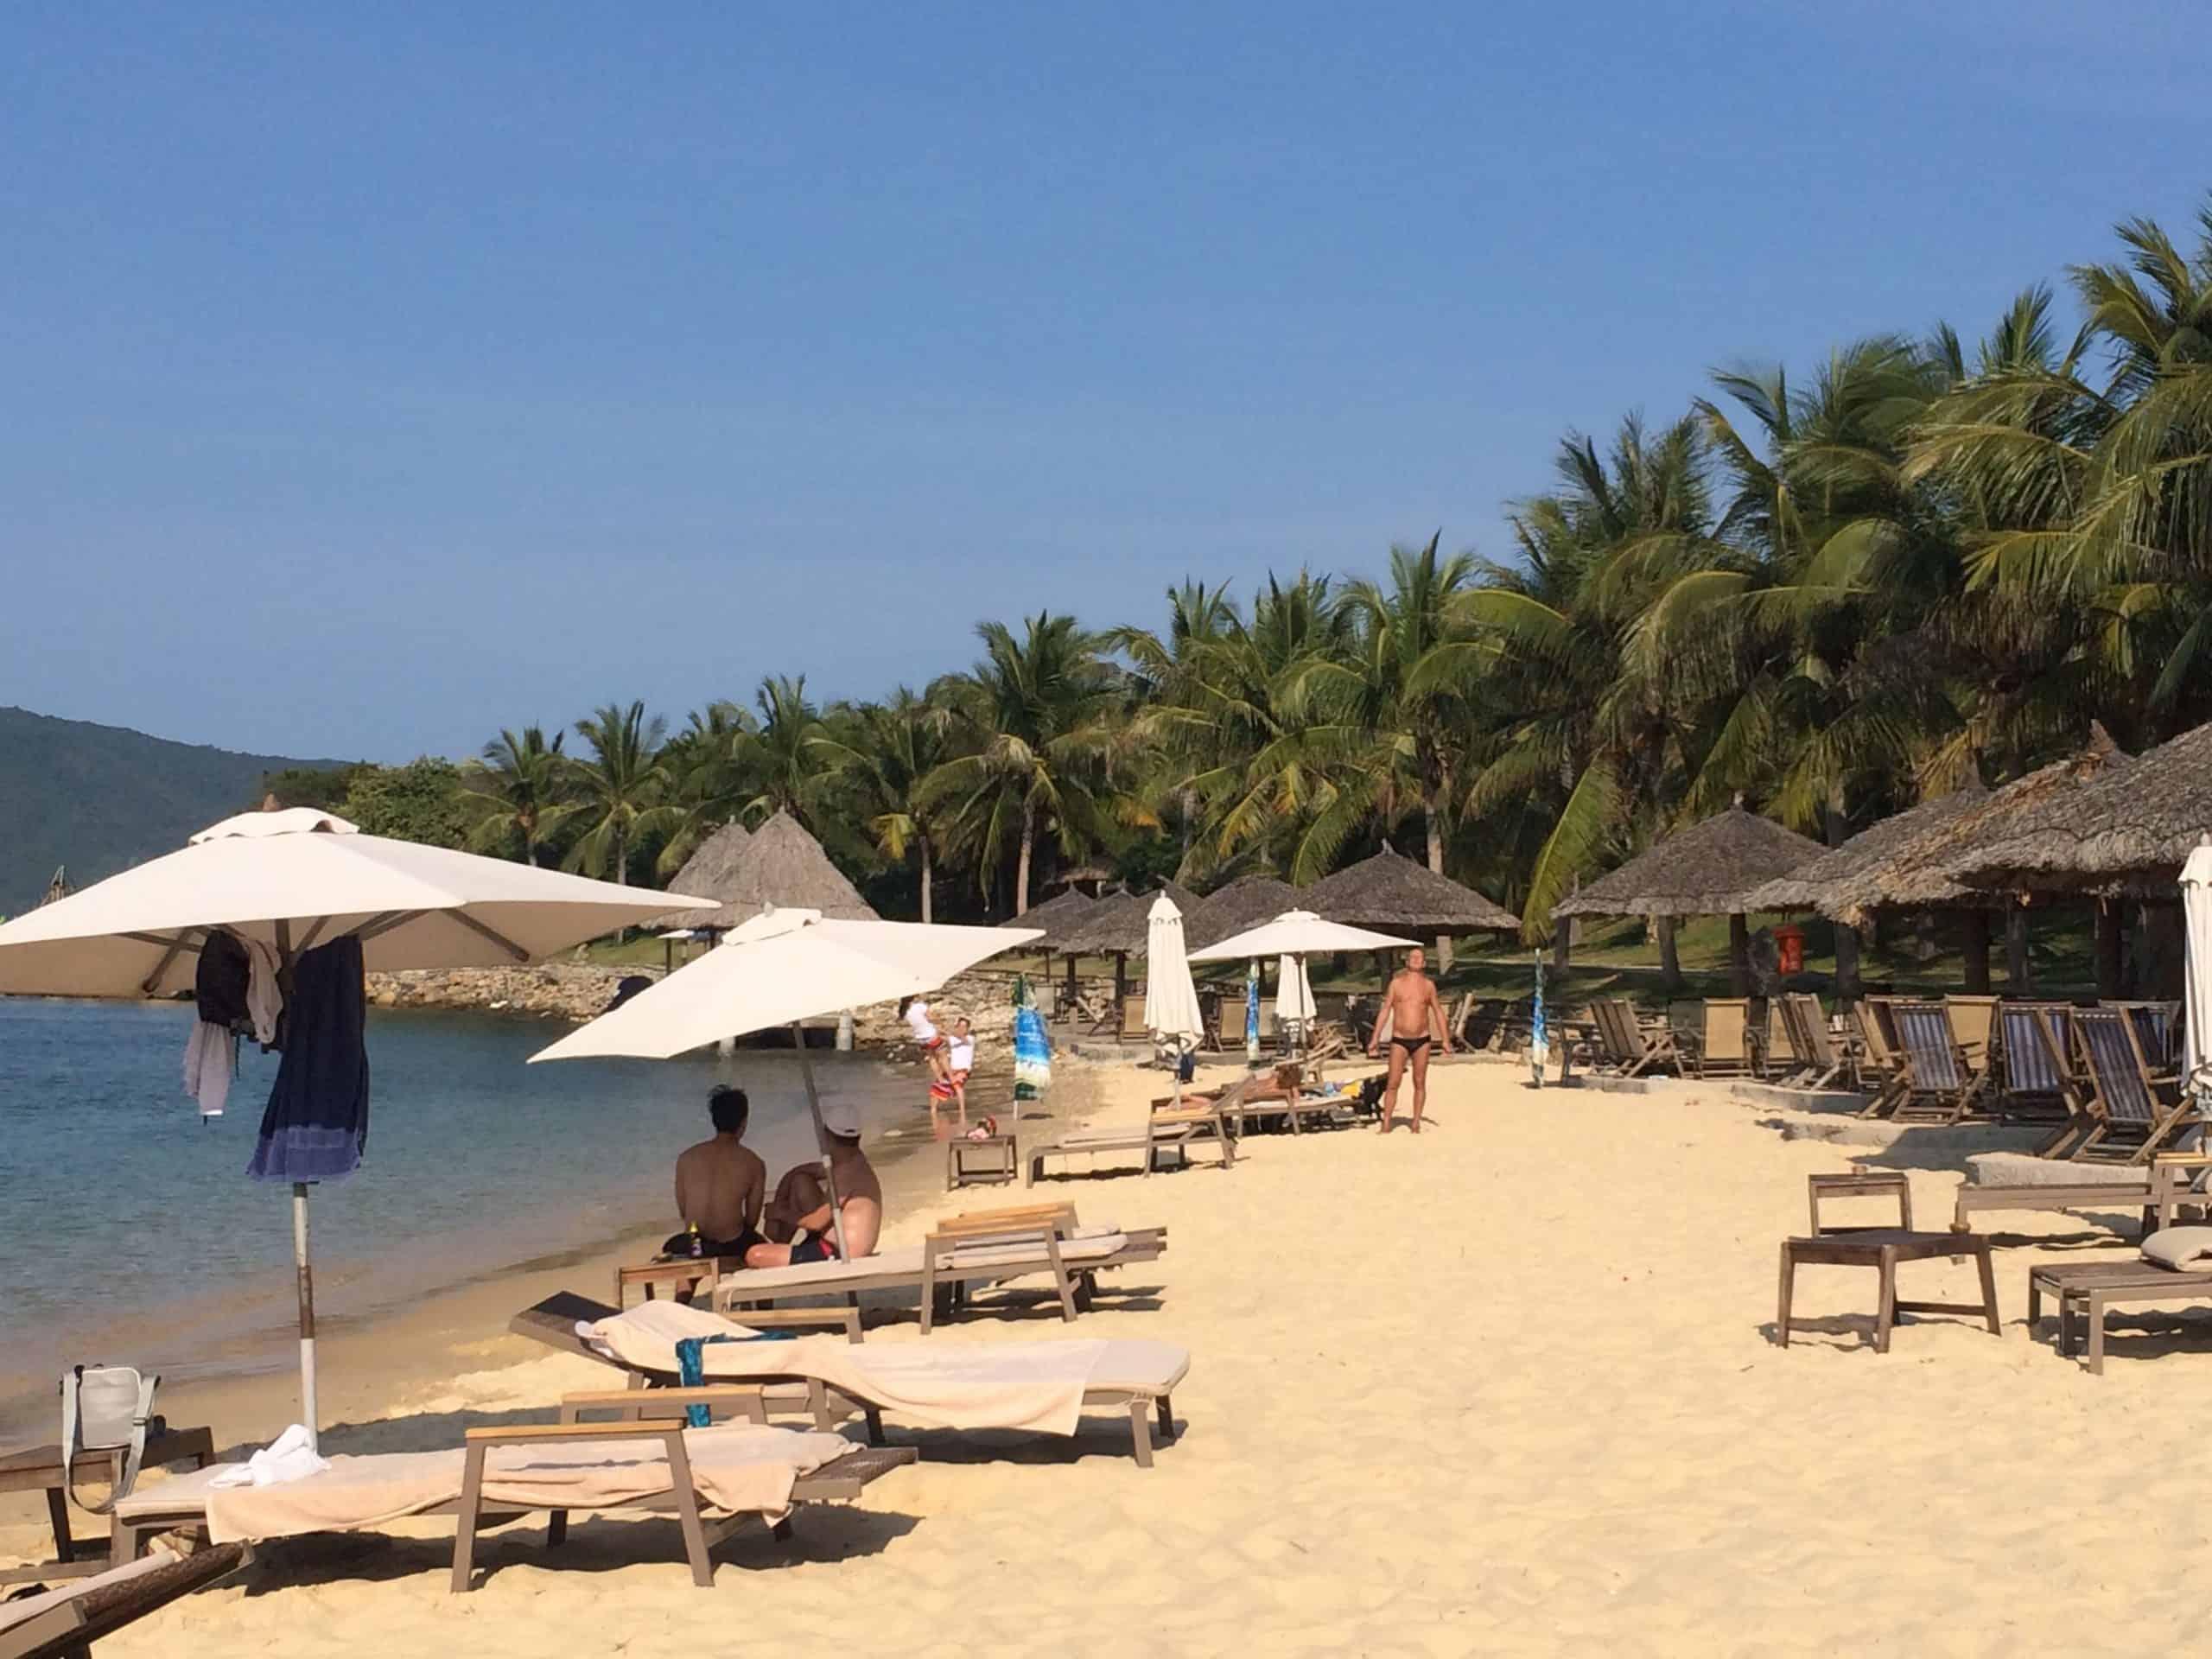 Relaxing at Hon Tam island